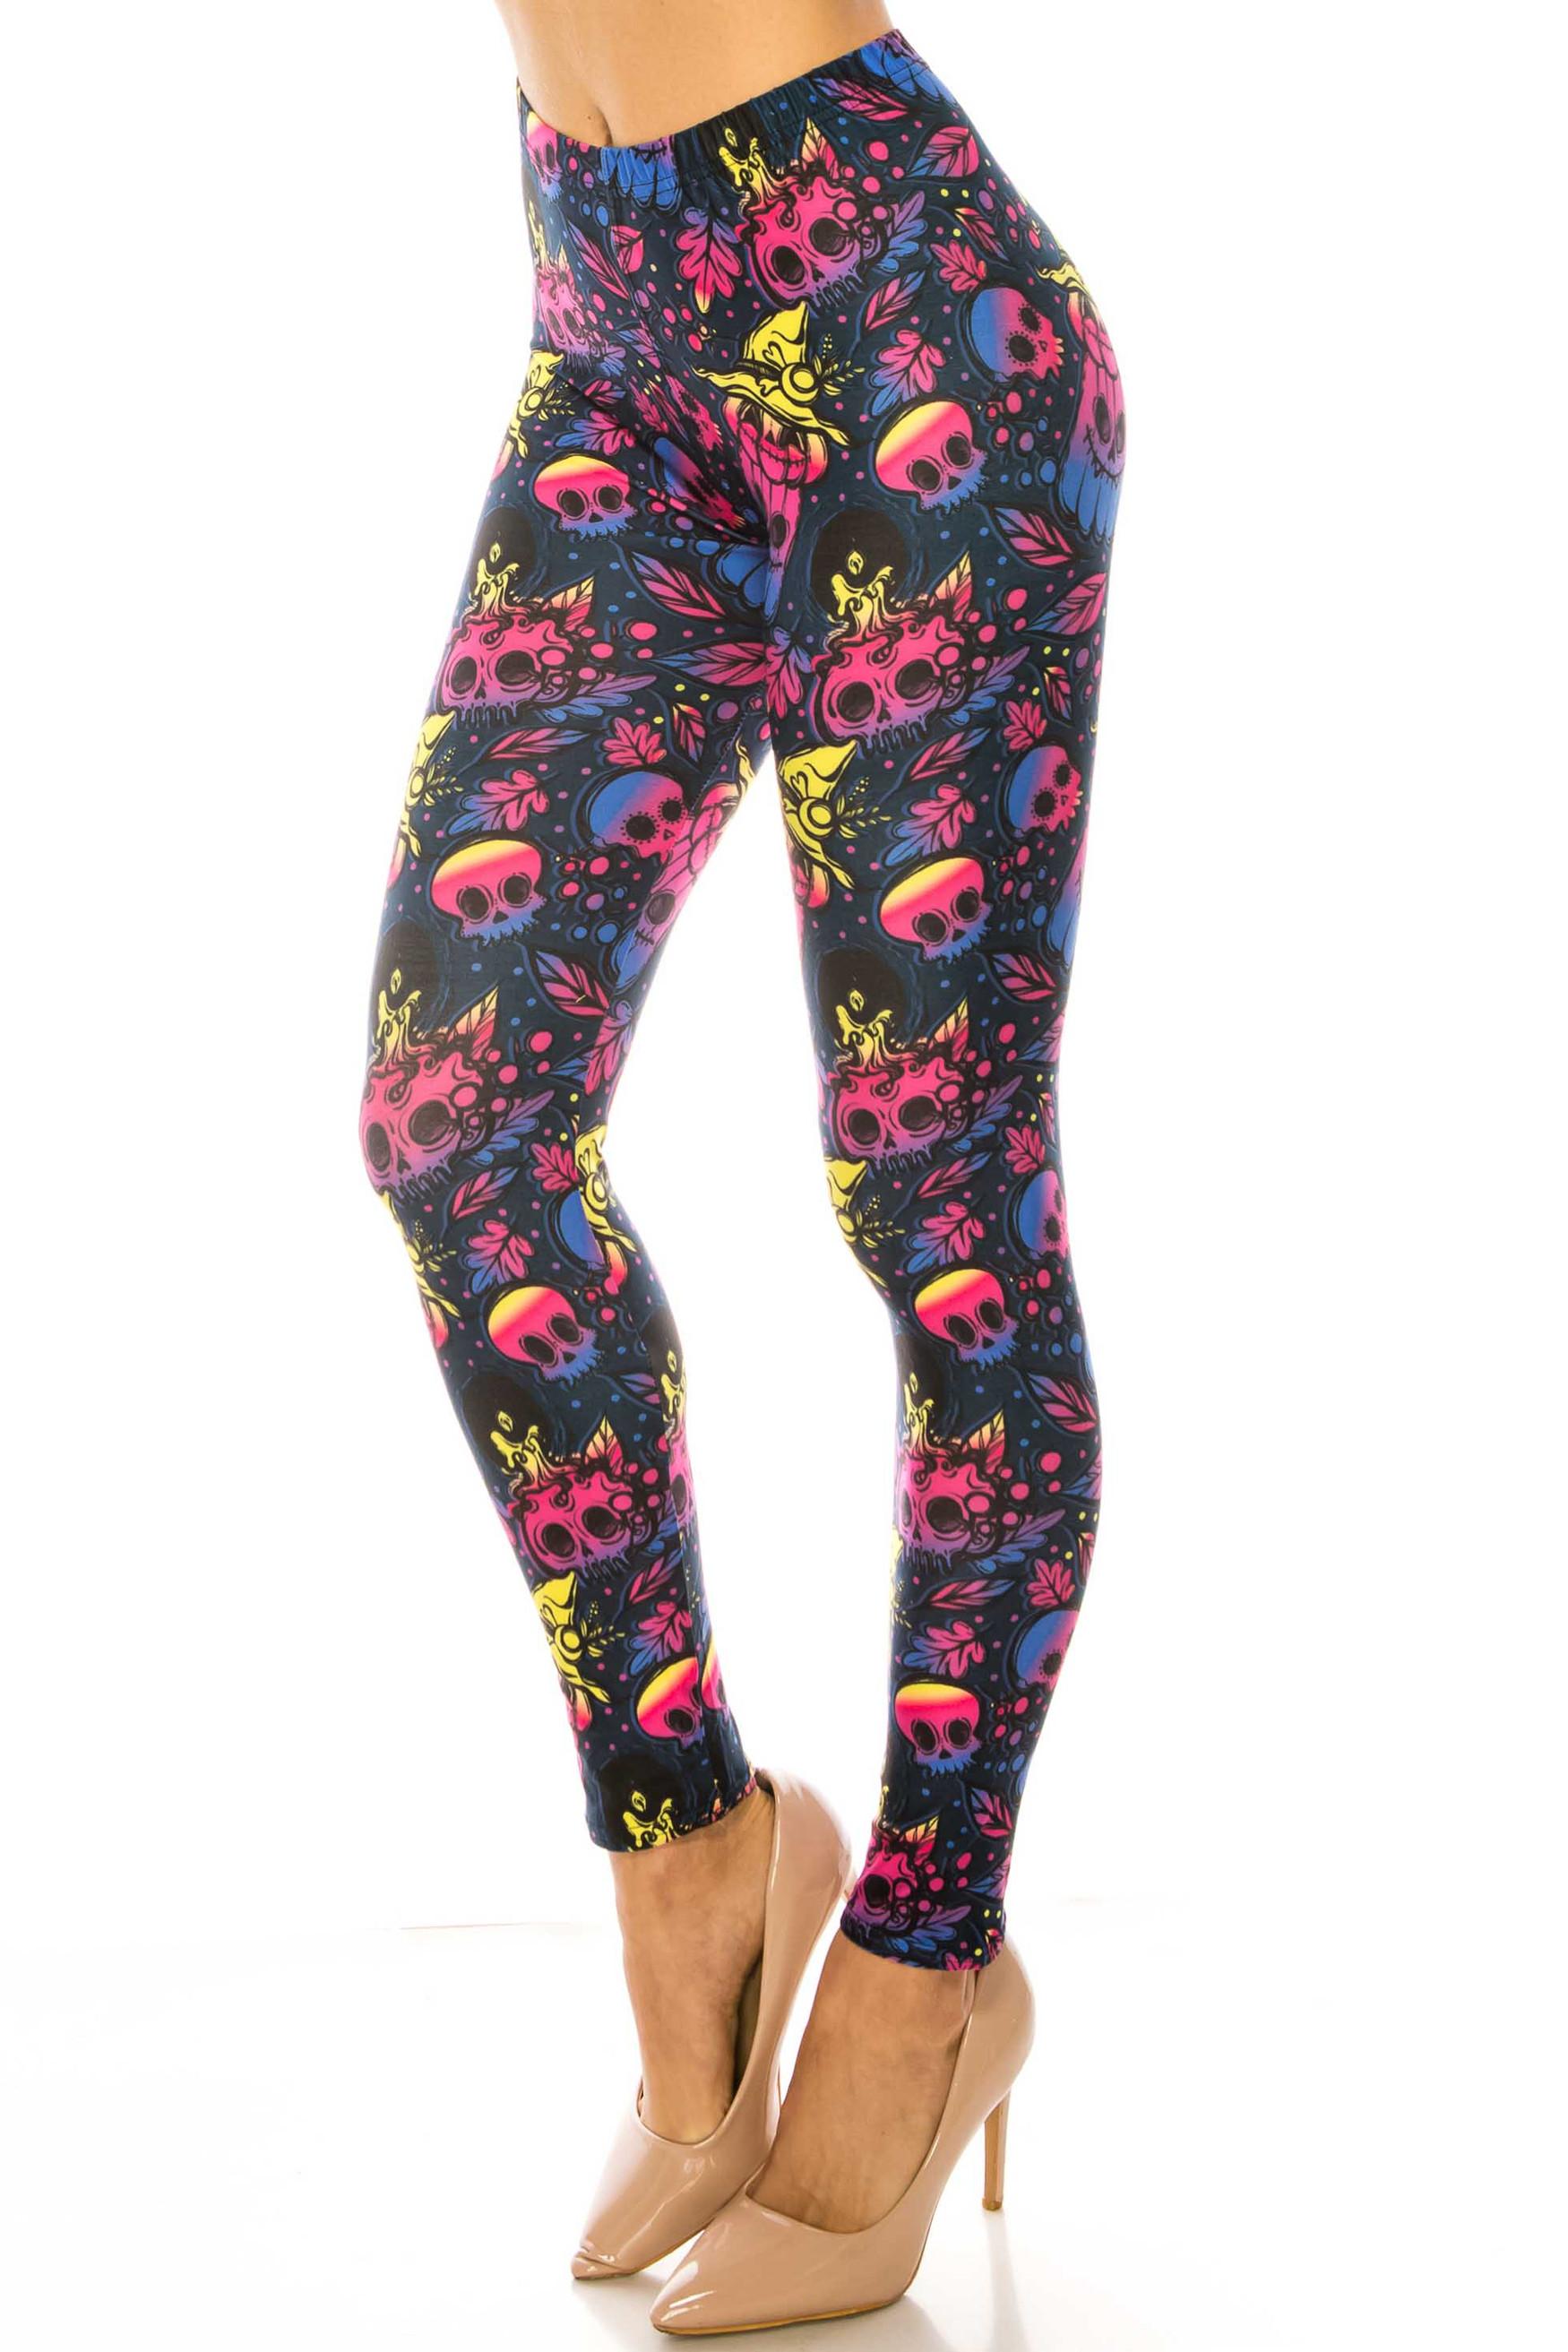 Wholesale Creamy Soft Autumn Ombre Skulls Extra Plus Size Leggings - 3X-5X - USA Fashion™